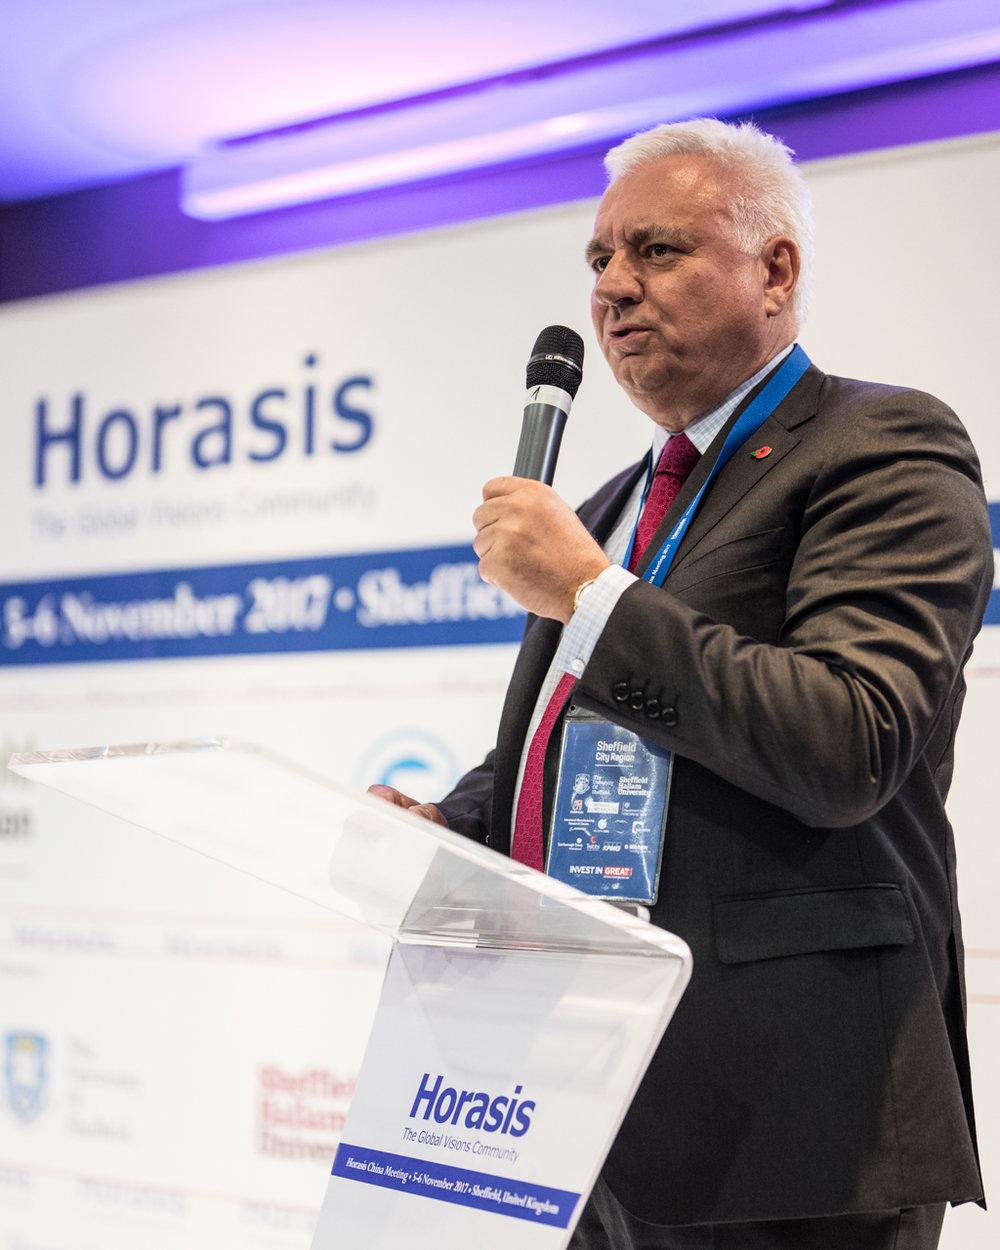 Horasis 2017 - 1420752.jpg